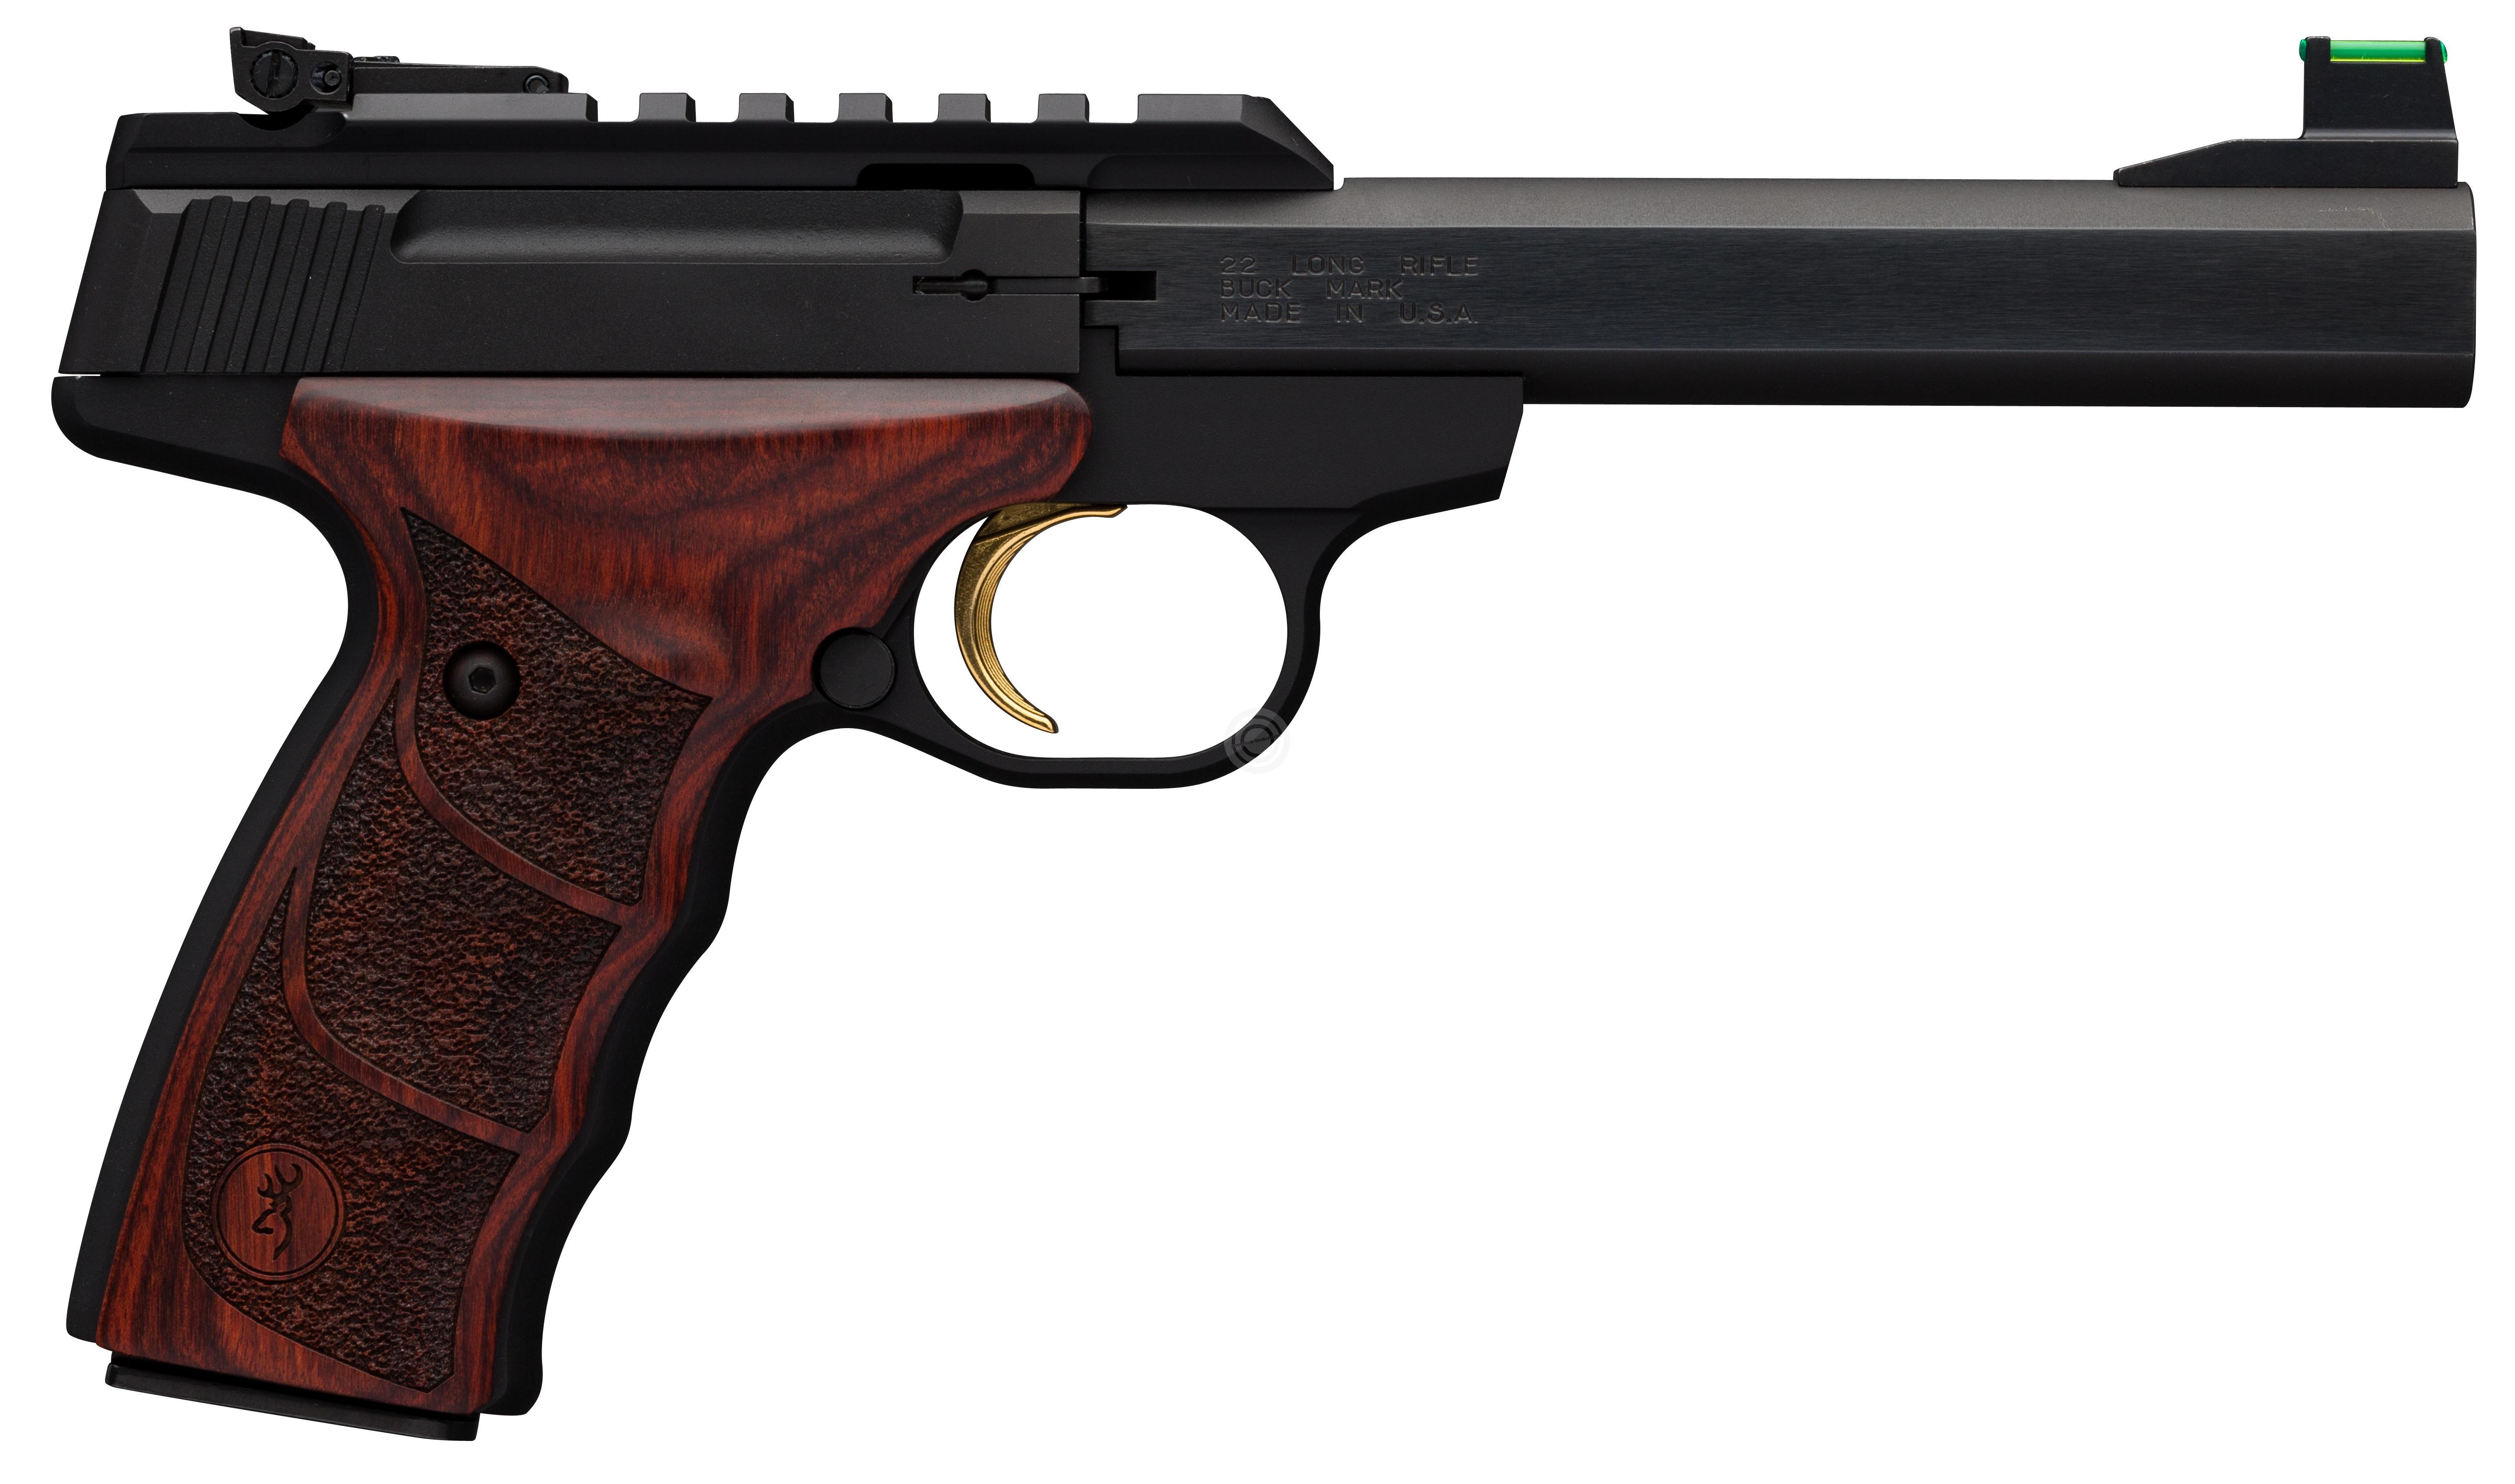 Pistolet BROWNING Buck Mark PLUS Rosewood UDX calibre 22Lr